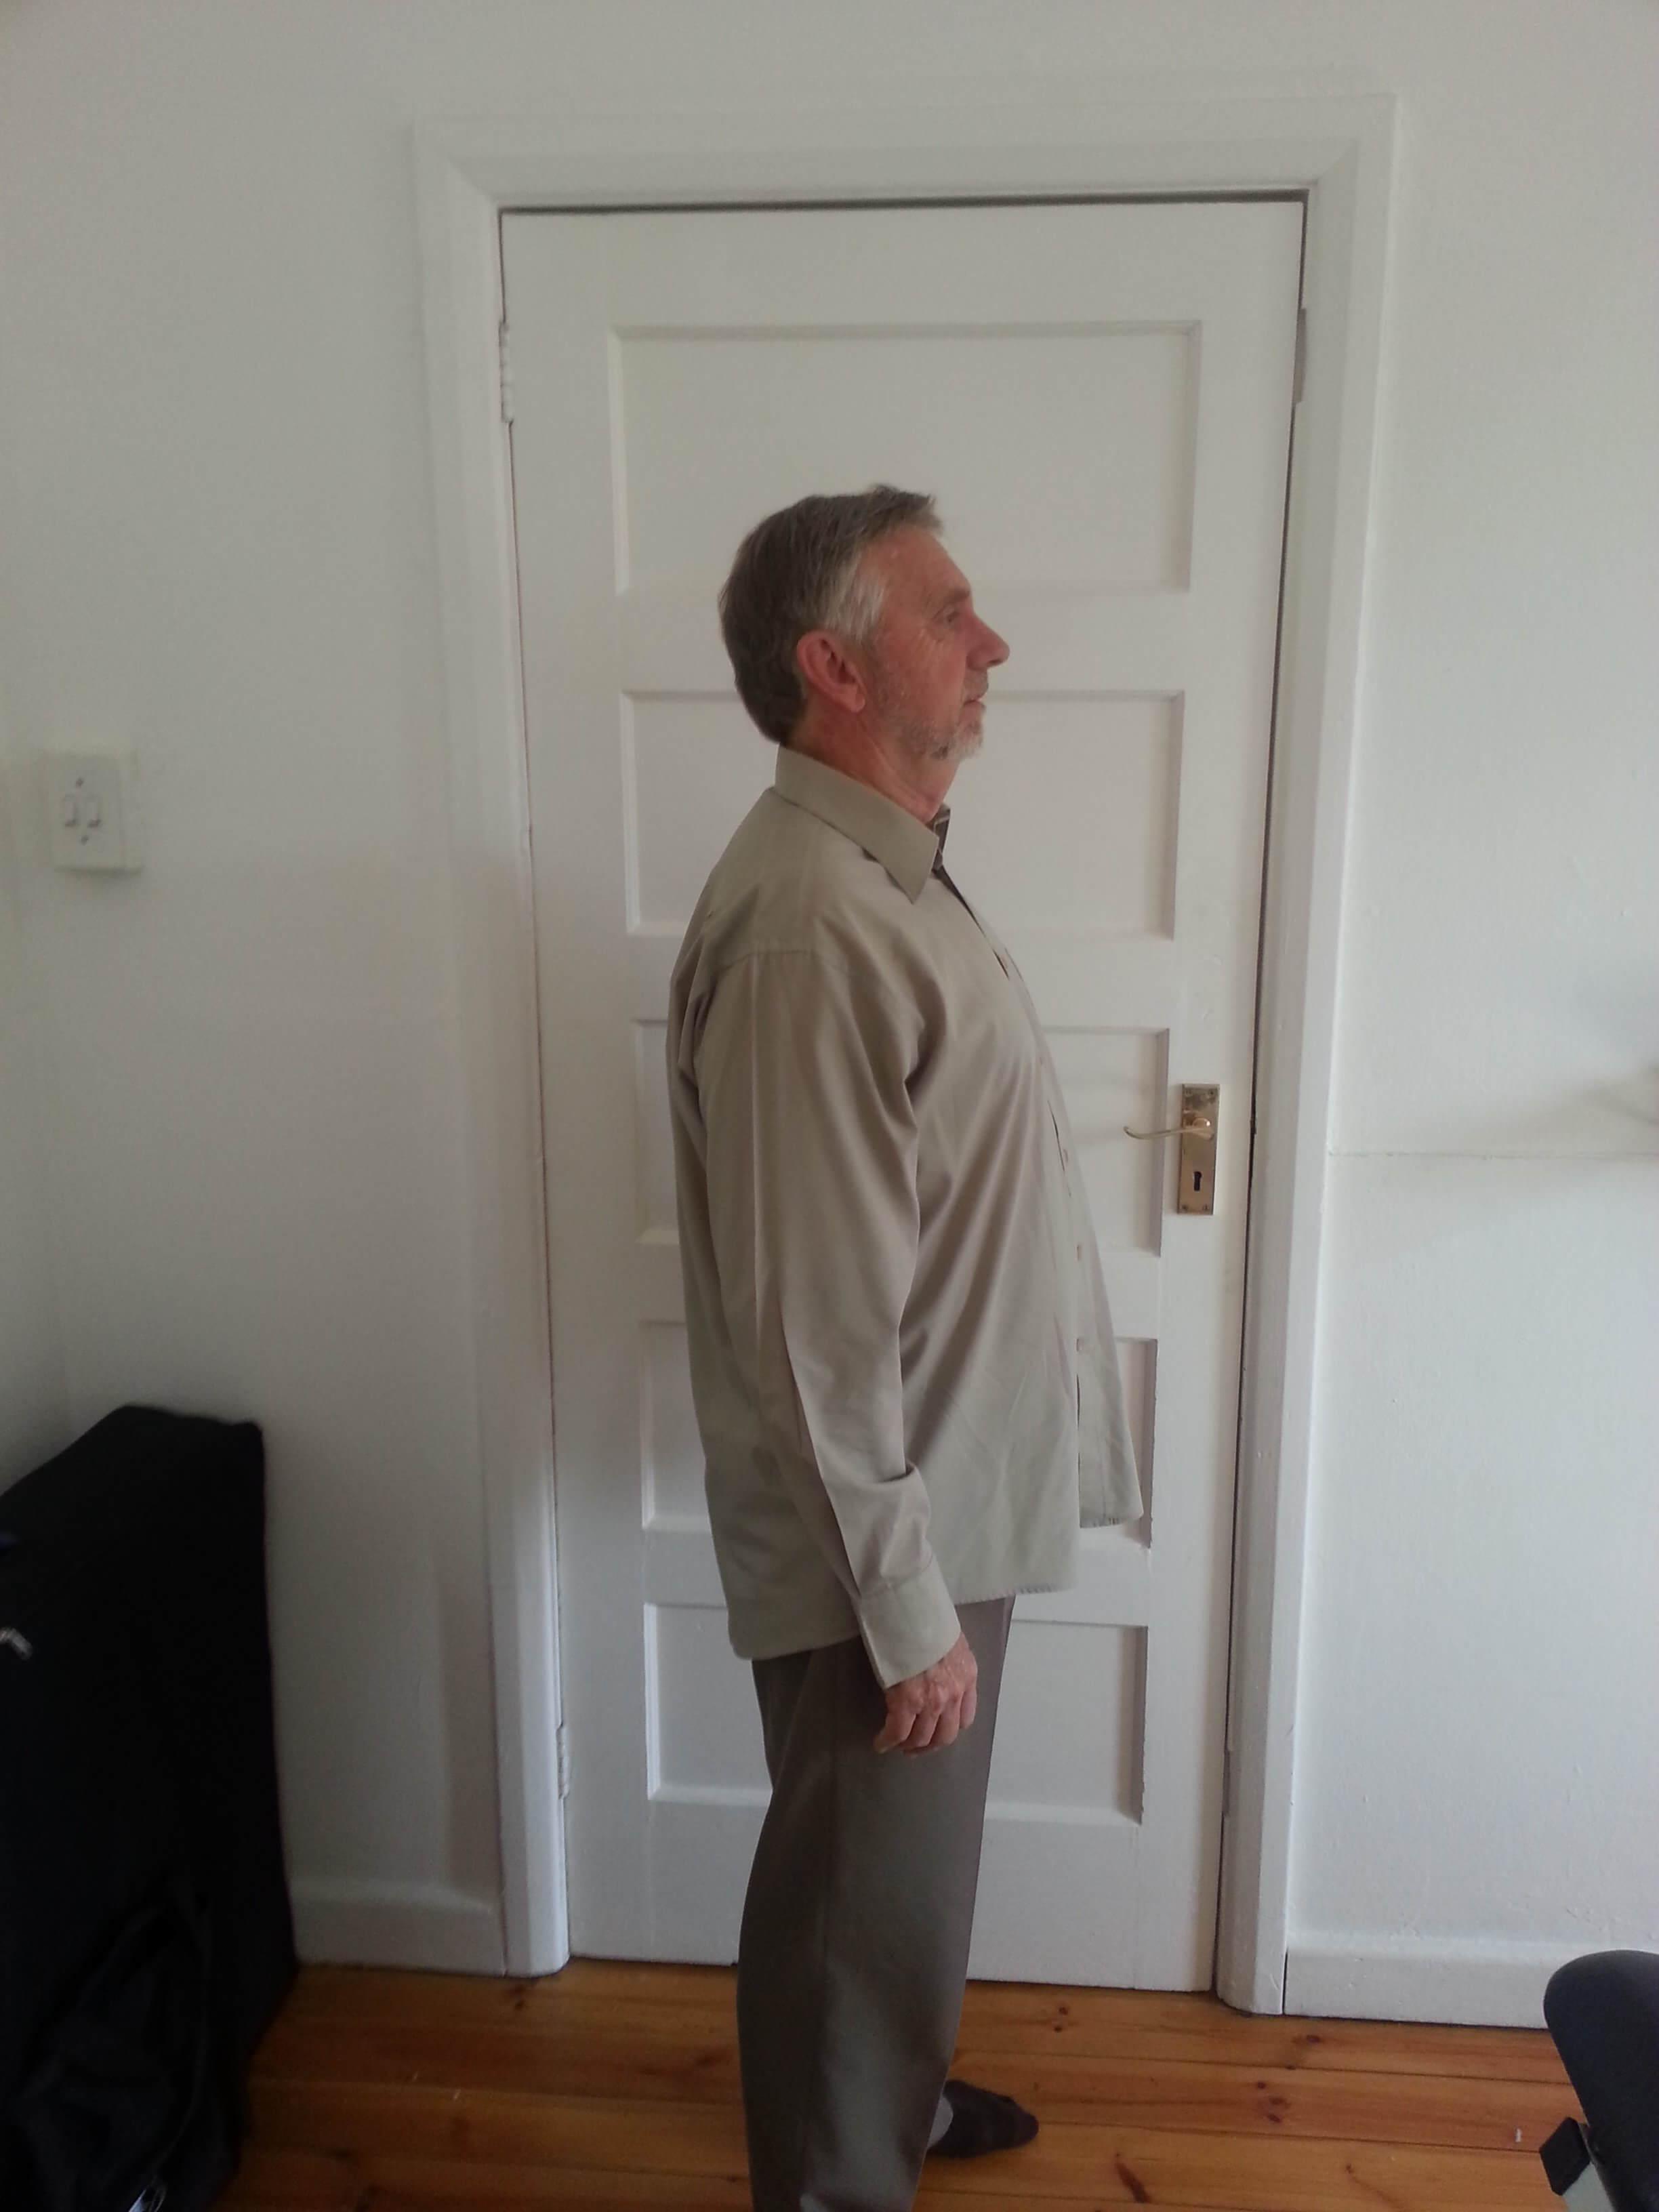 after posture correction